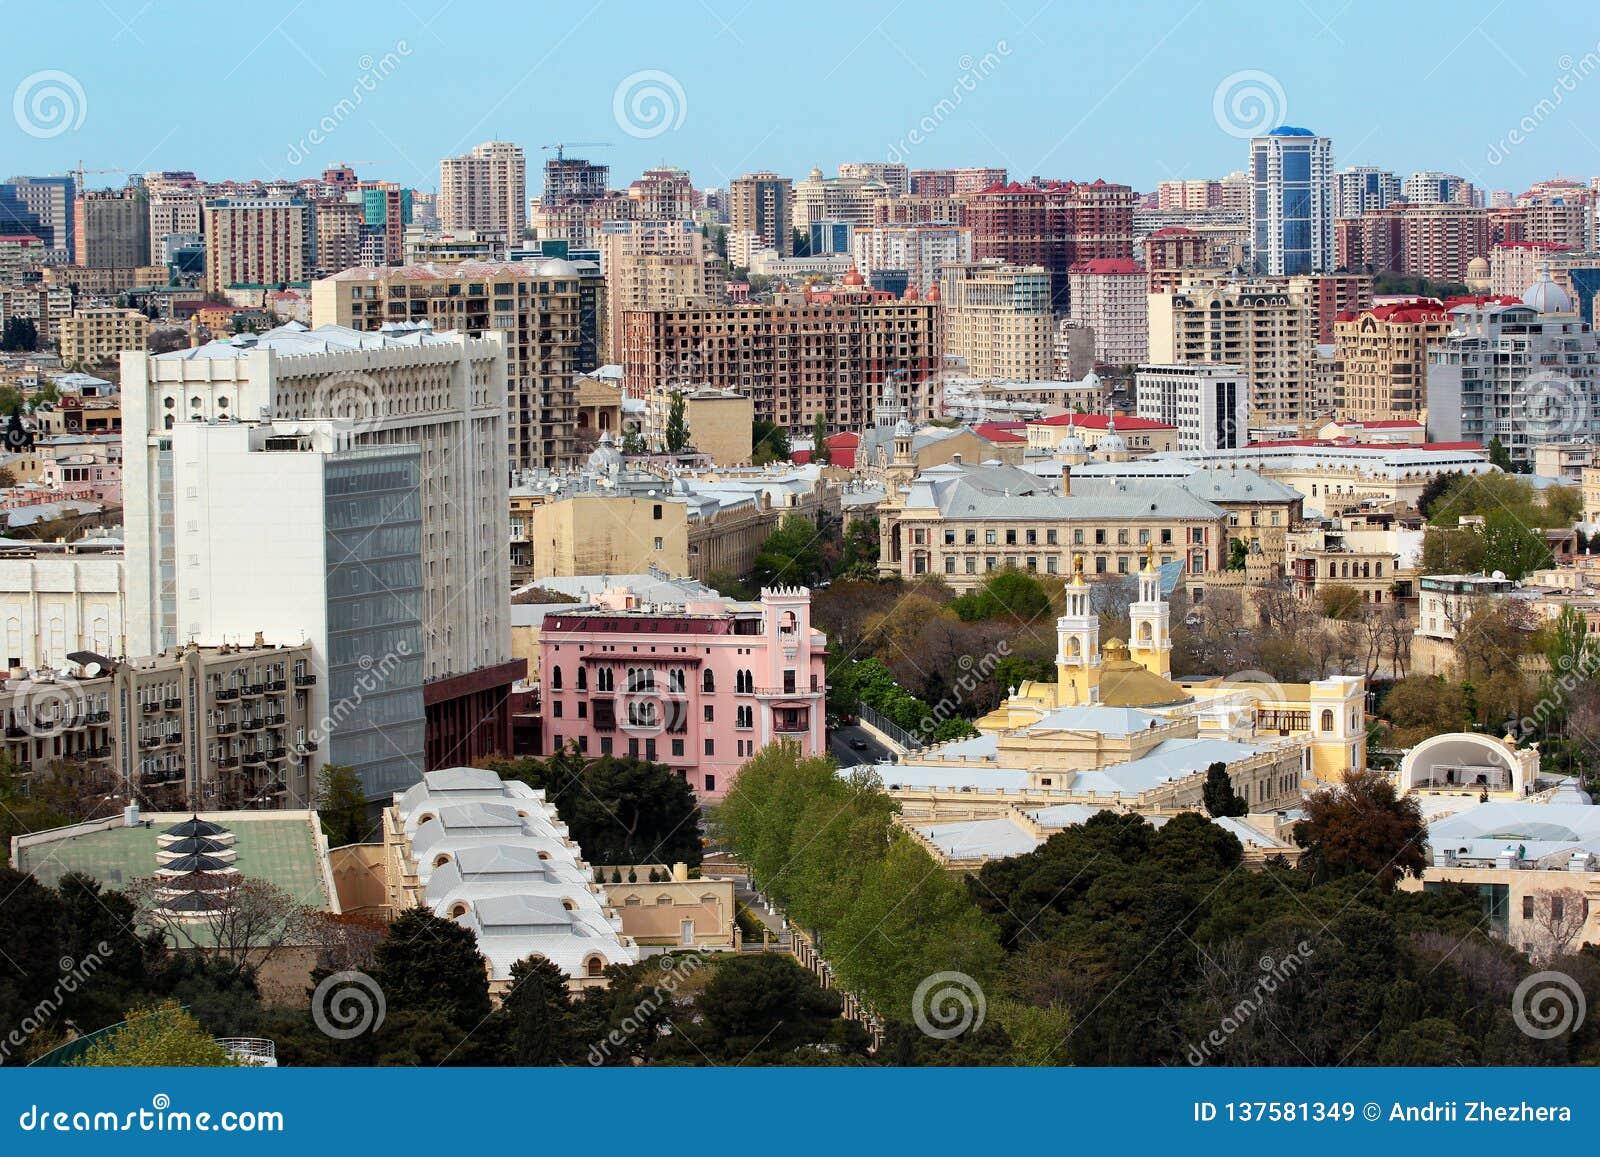 Баку, Азербайджан: отзывы туристов о Баку 2020 | 1155x1600